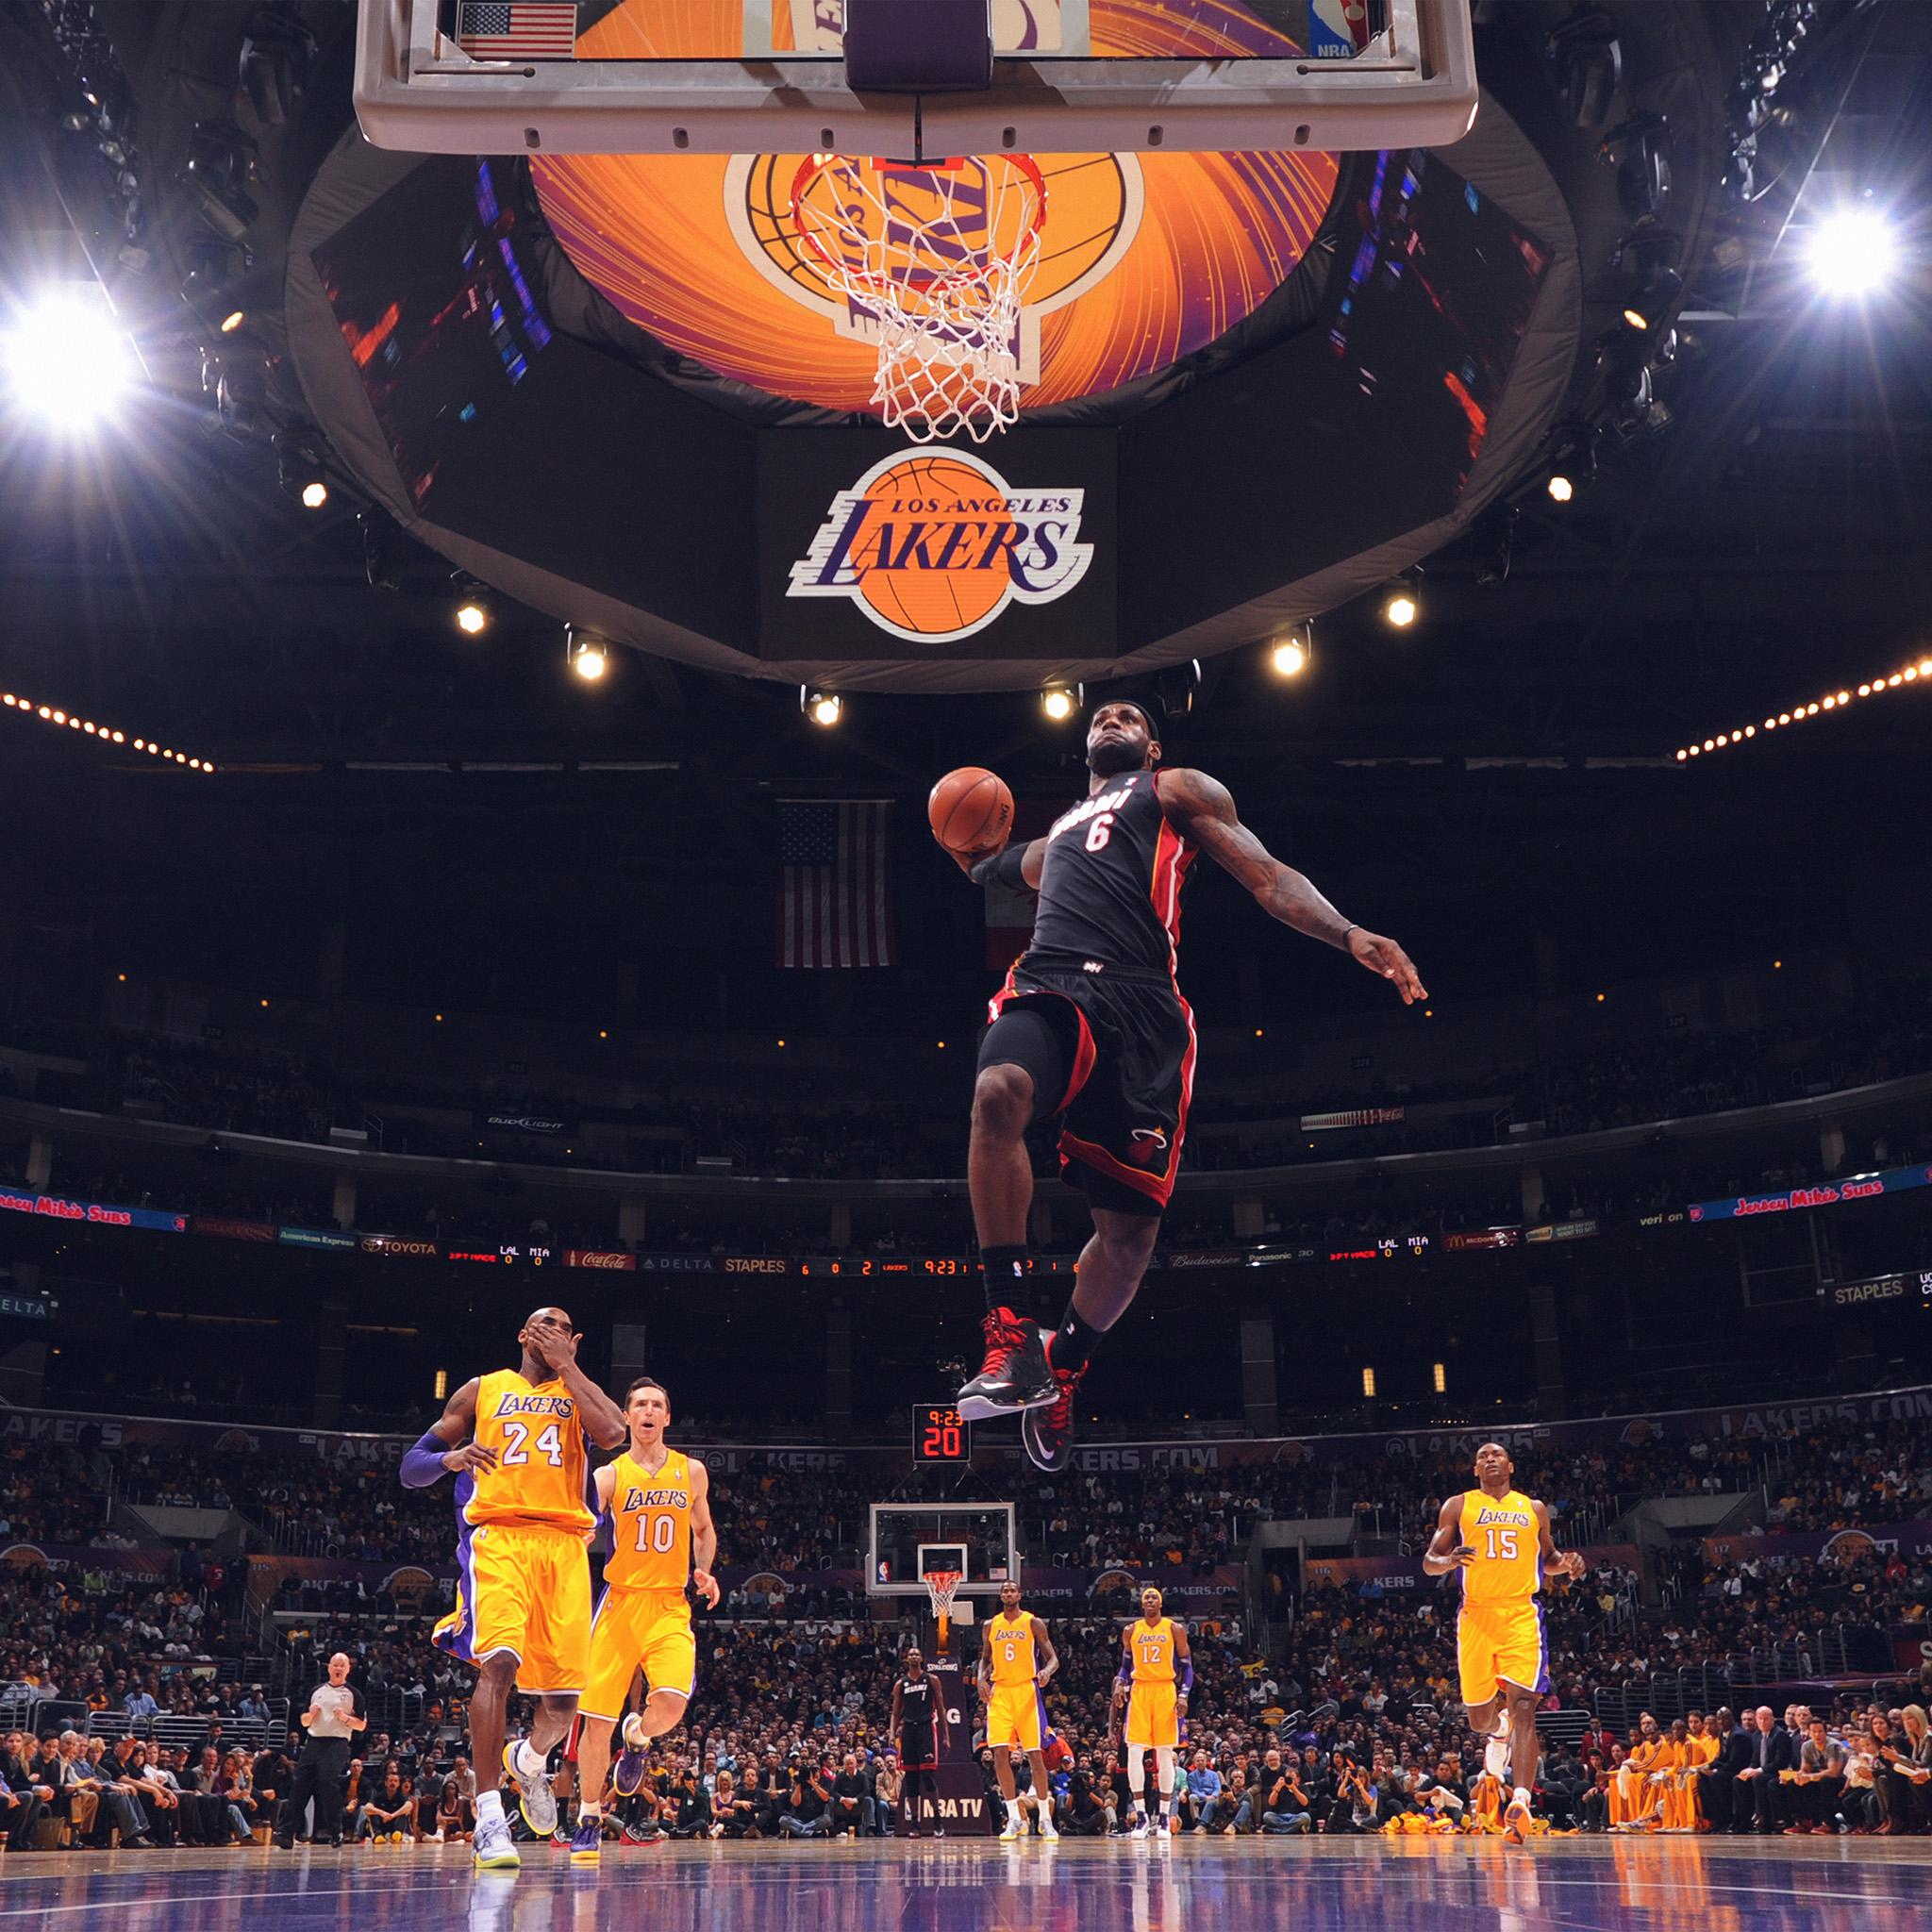 Iphone Wallpaper: Hi84-lebron-james-nba-basketball-dunk-wallpaper